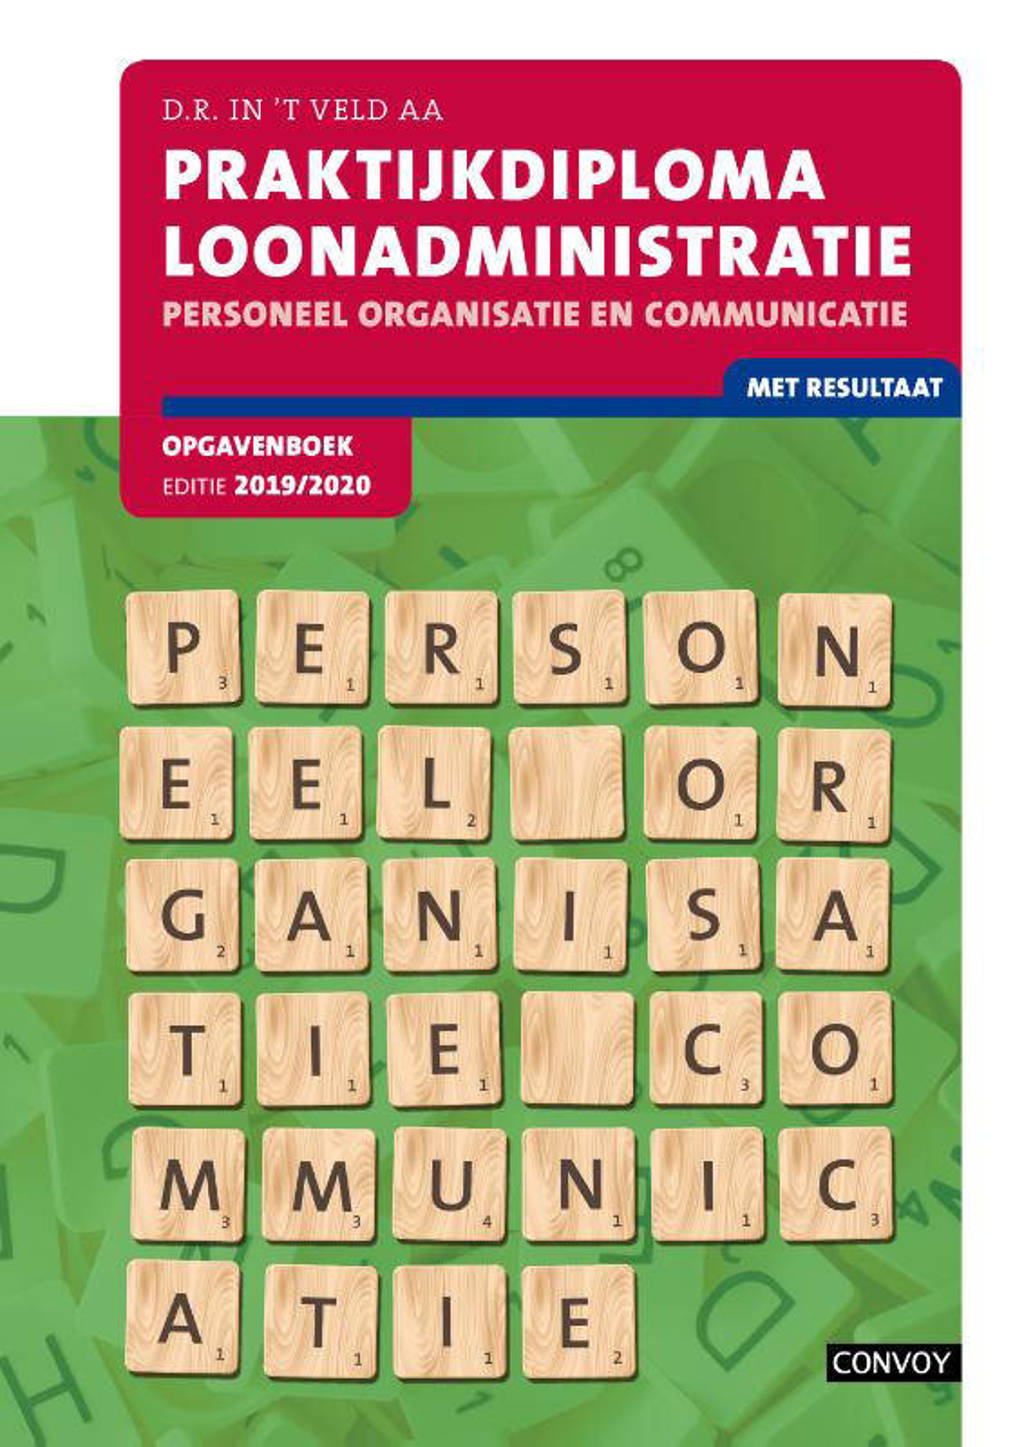 Praktijkdiploma loonadministratie 2019-2020 Opgavenboek - D.R. in 't Veld